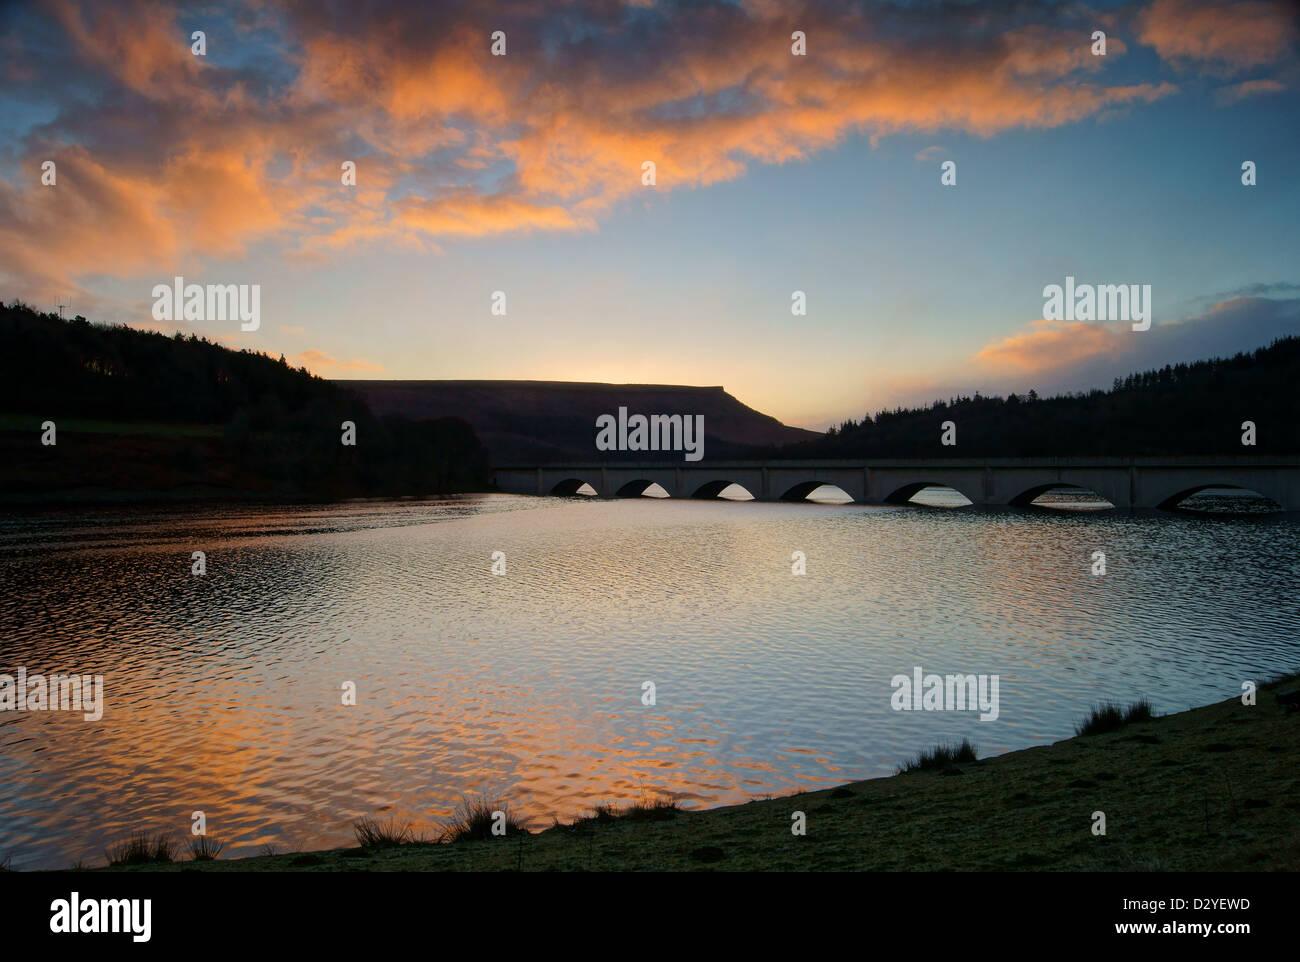 UK, Peak District,Derbyshire,Sunrise over Ladybower Reservoir & Ashopton Viaduct - Stock Image